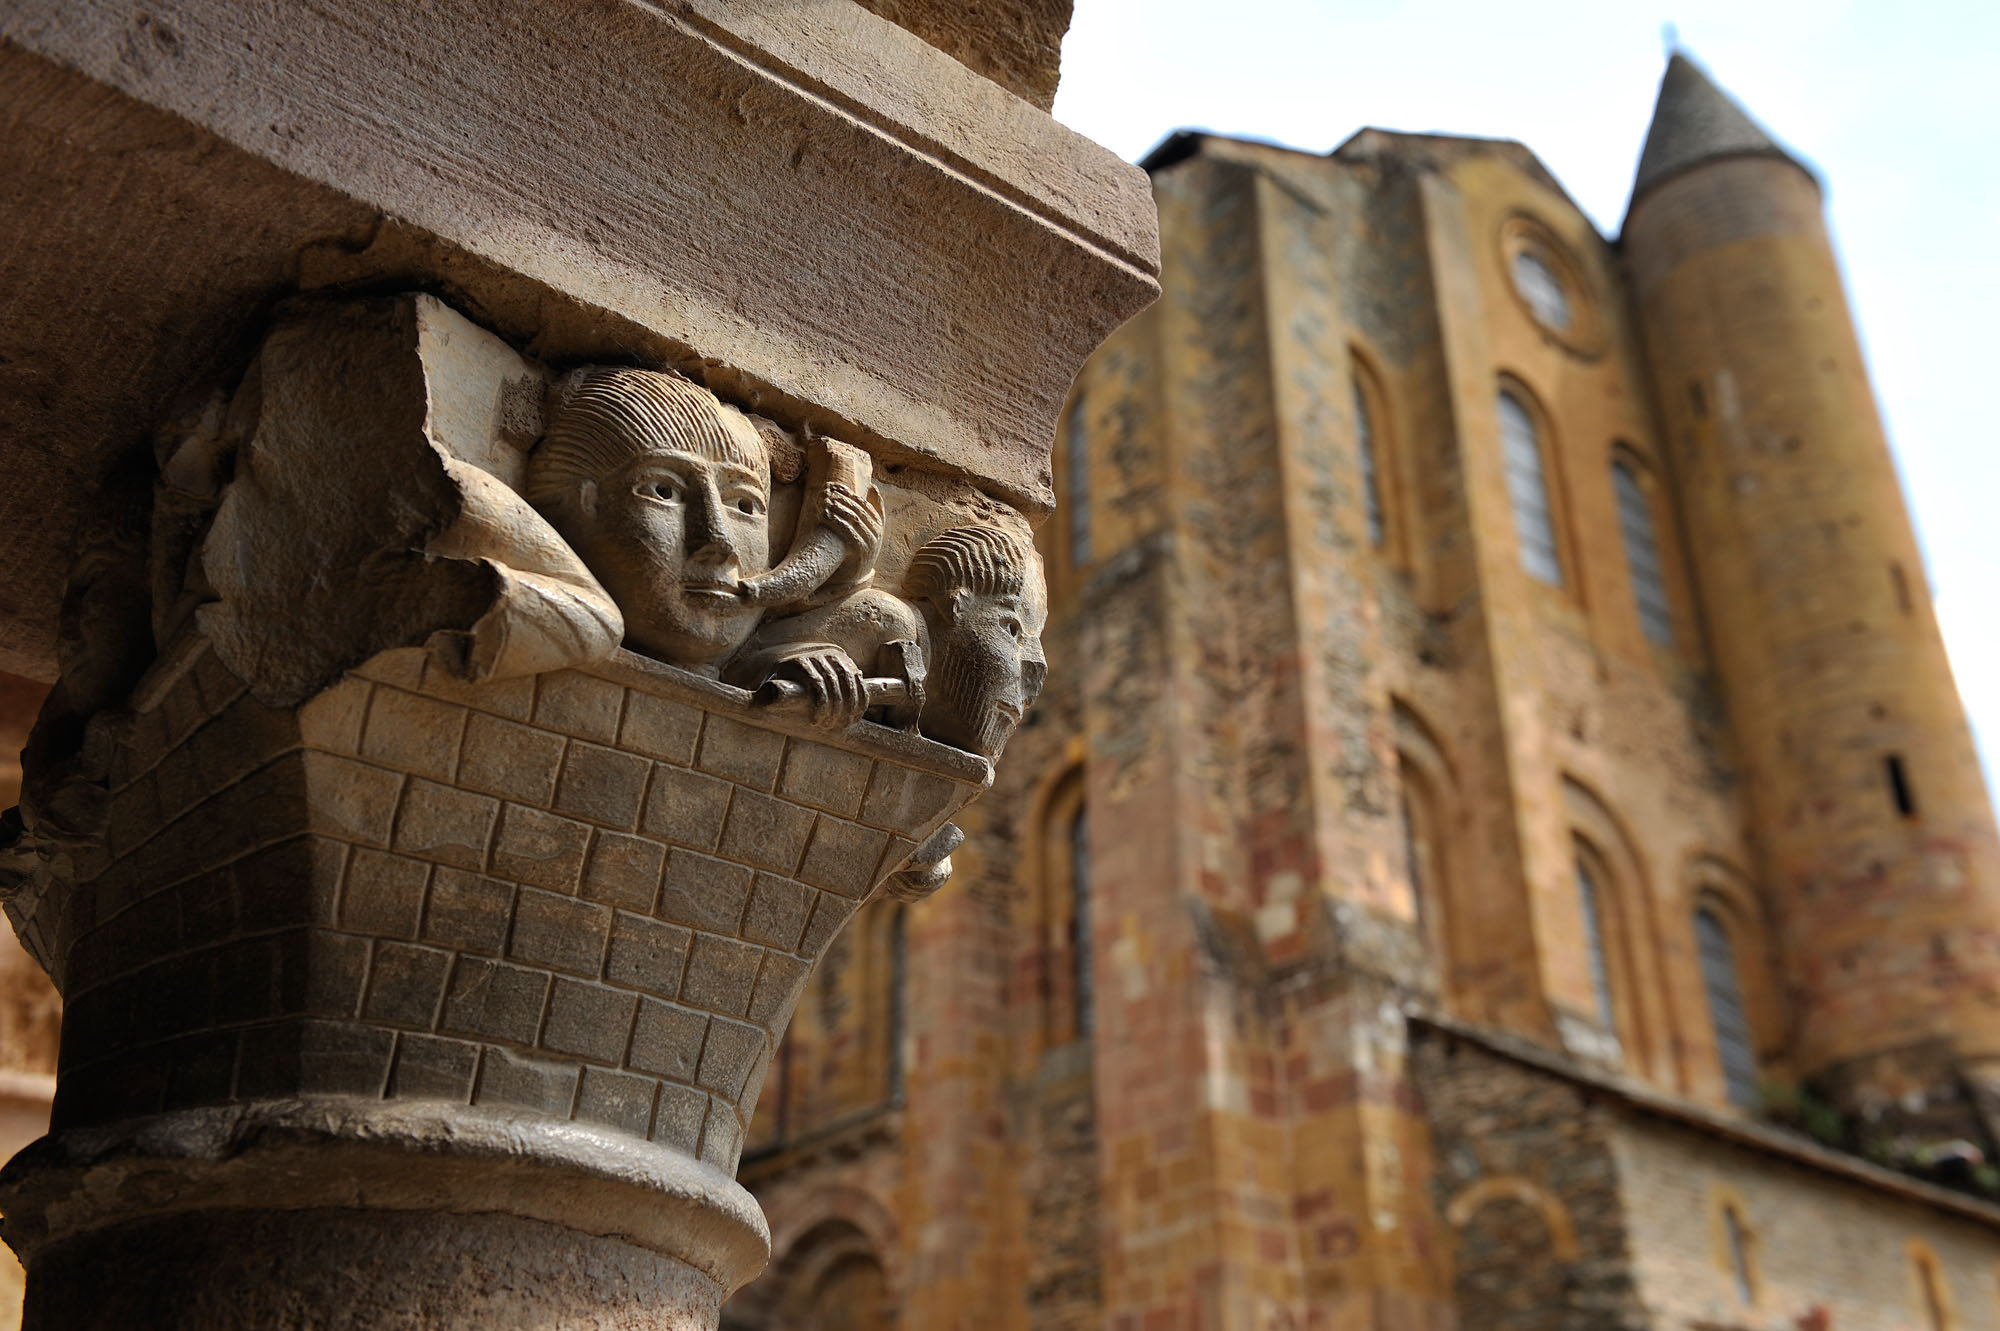 Cloître de l'abbatiale Sainte Foy de Conques